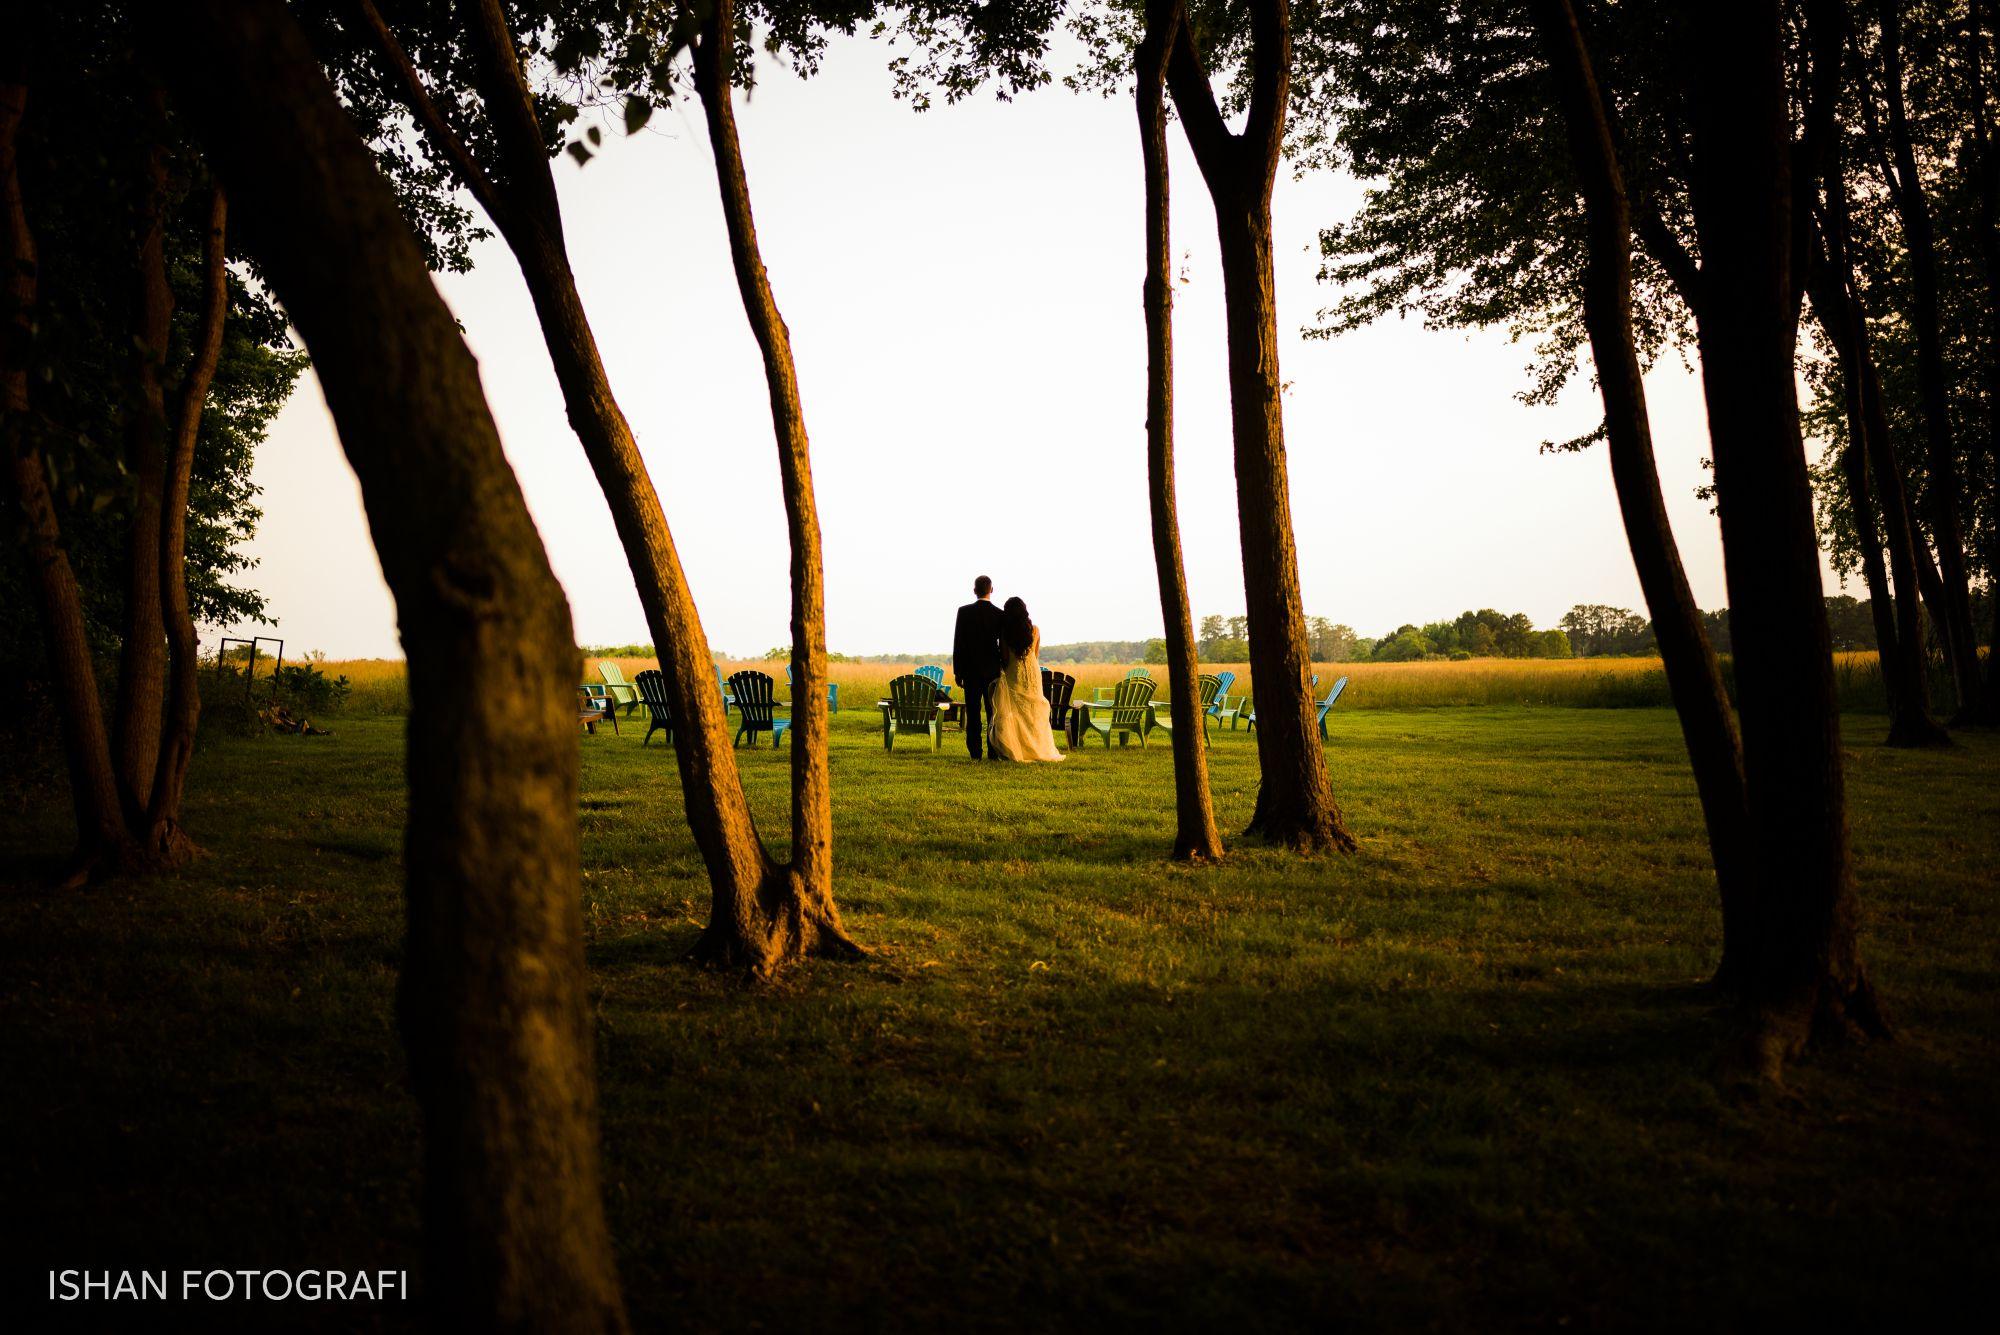 kent-manor-inn-trees